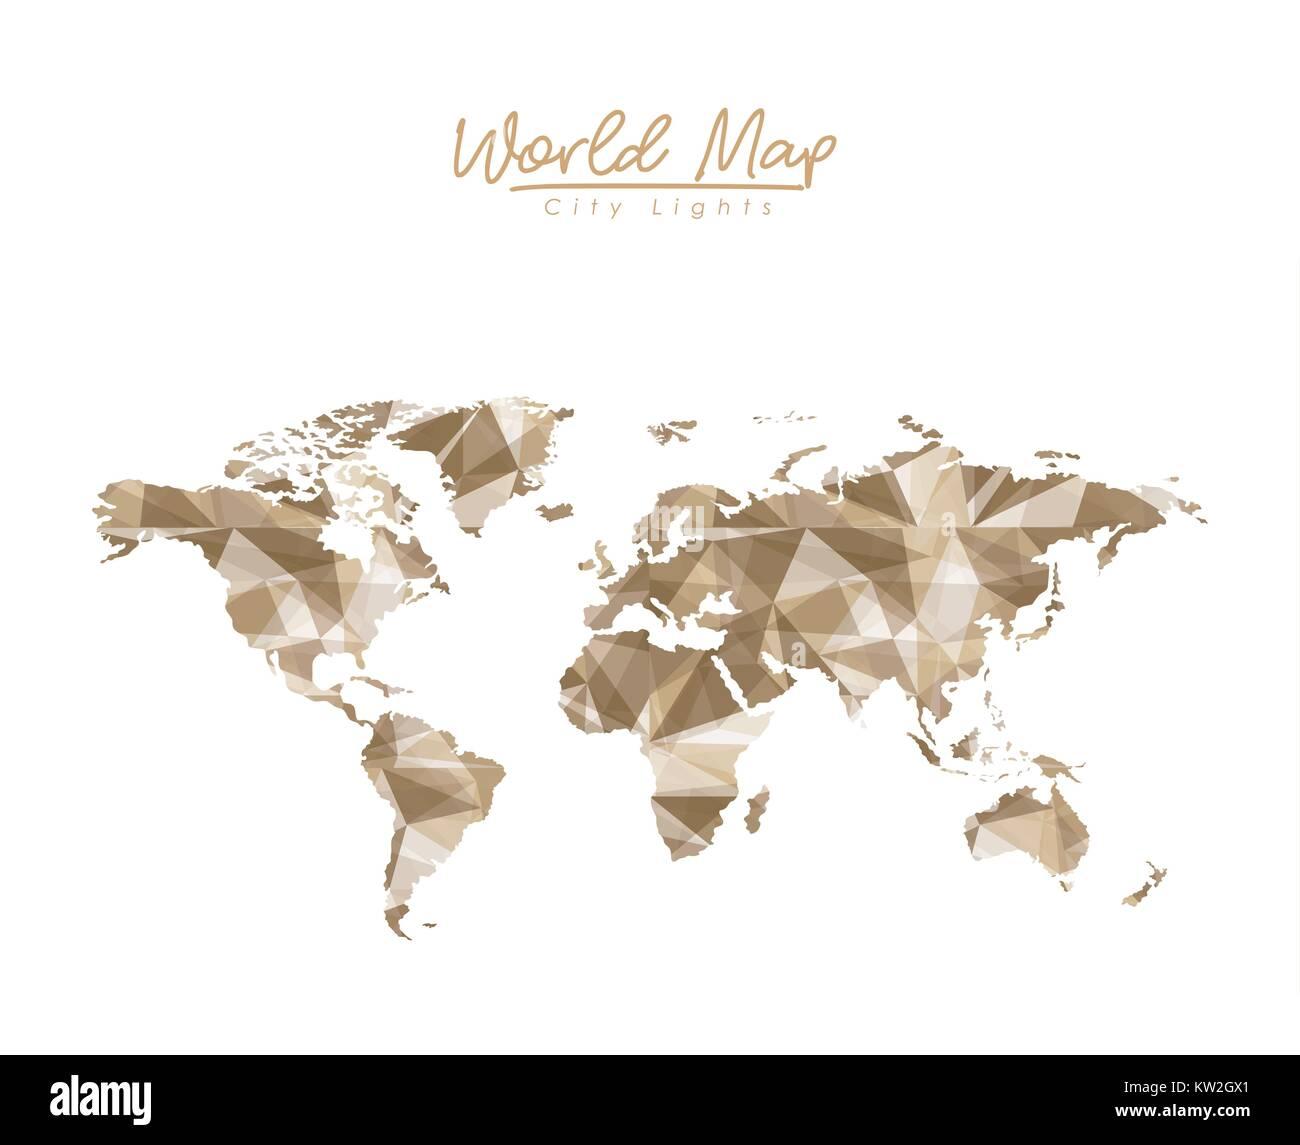 World map city lights in light brown polygon silhouette stock vector world map city lights in light brown polygon silhouette gumiabroncs Image collections